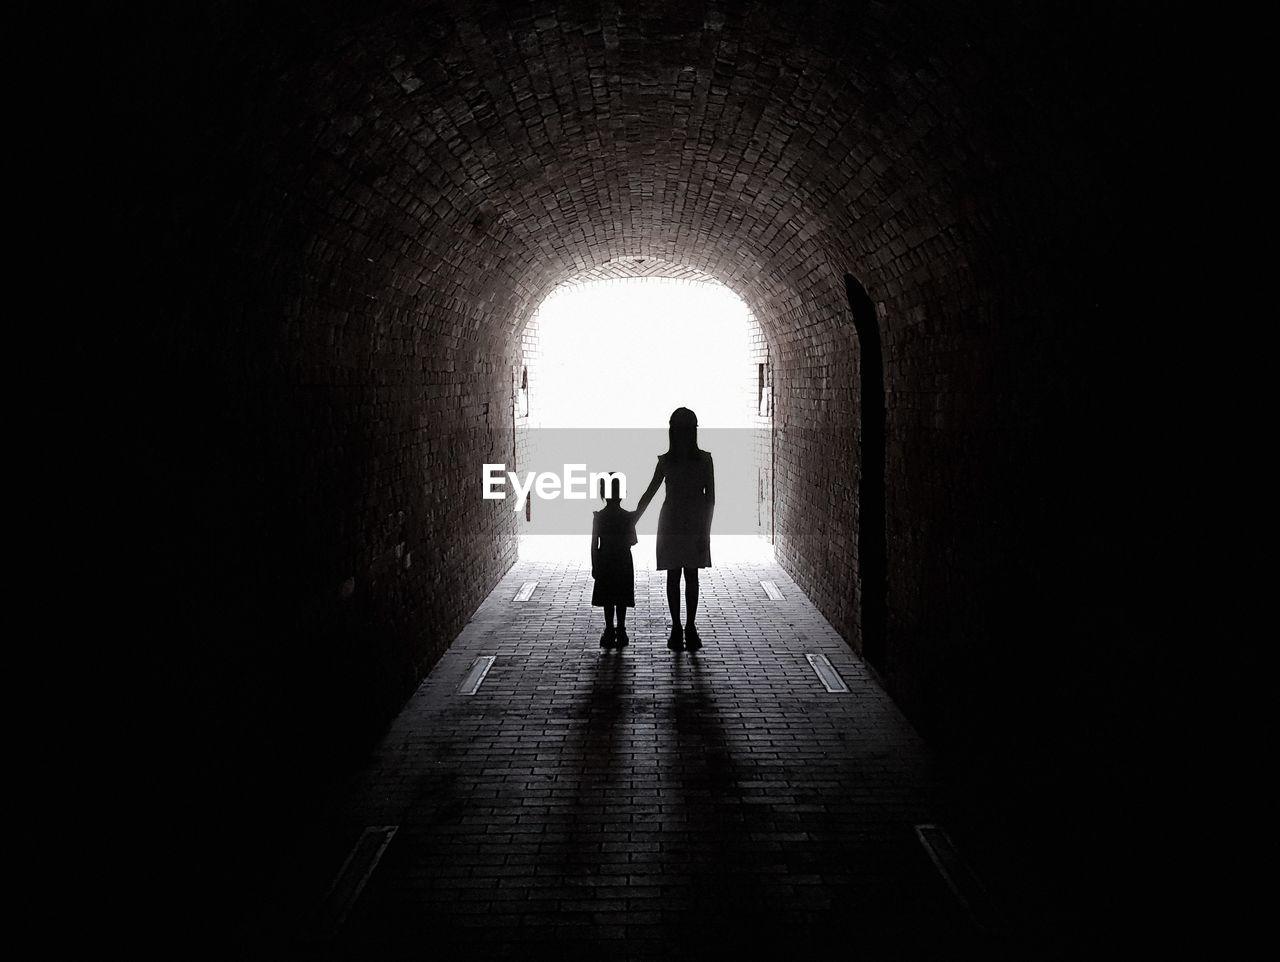 Silhouette Siblings Standing In Archway